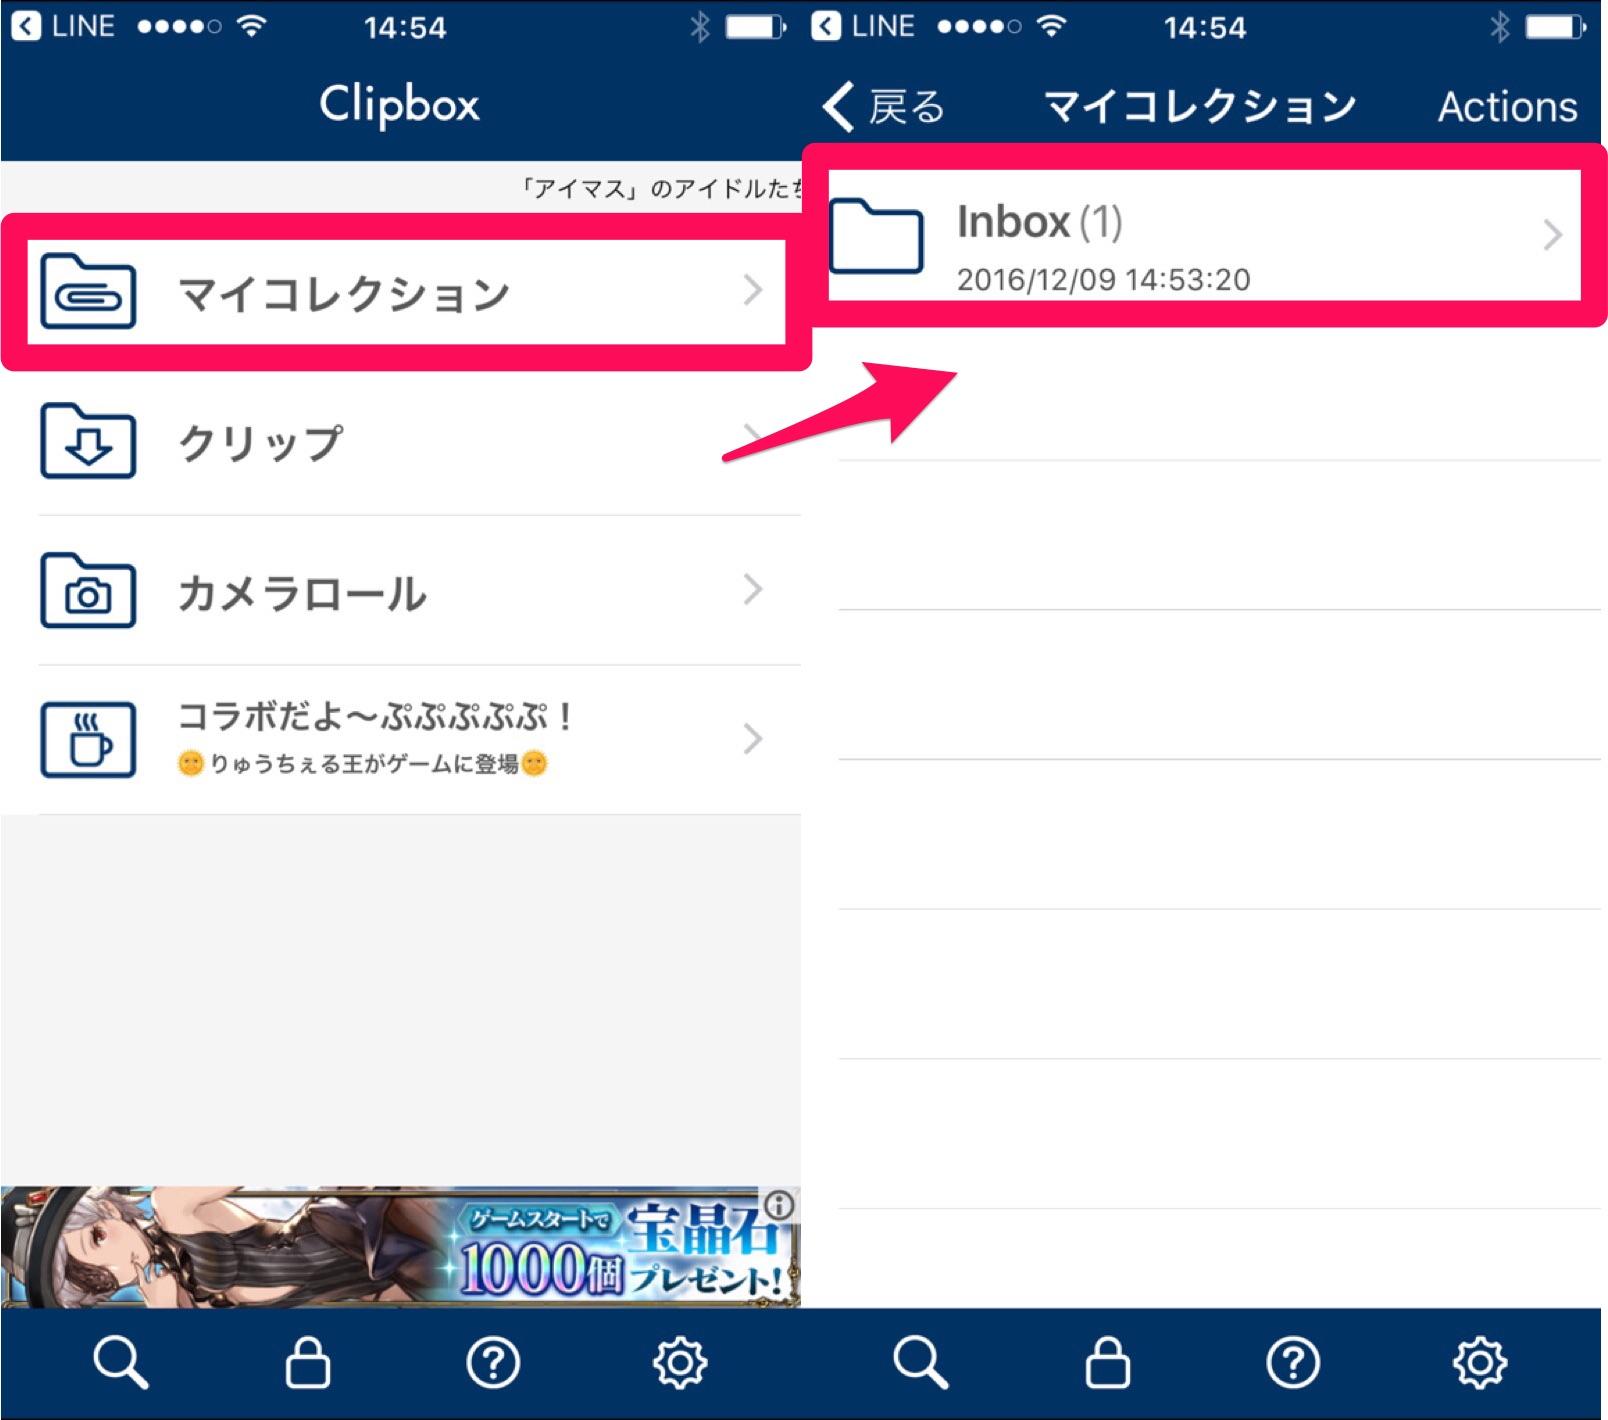 Inboxフォルダ